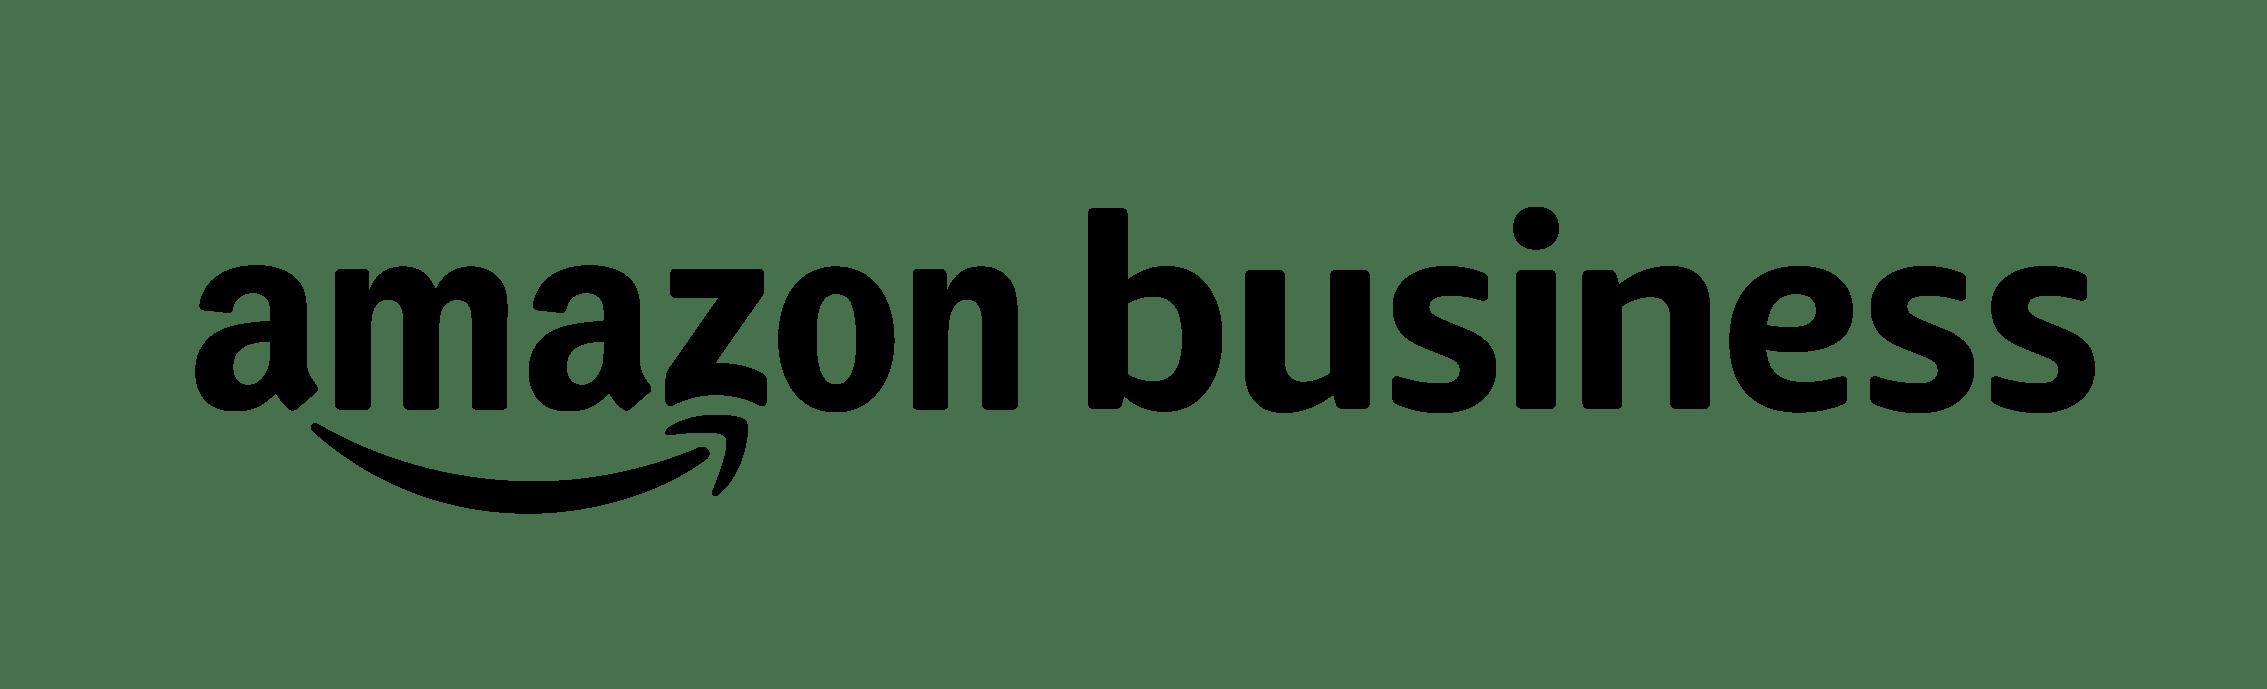 https://cdn.sellerapp.com/website/v2/amazon-bpo-webinar-page/amazon-business-logo.png